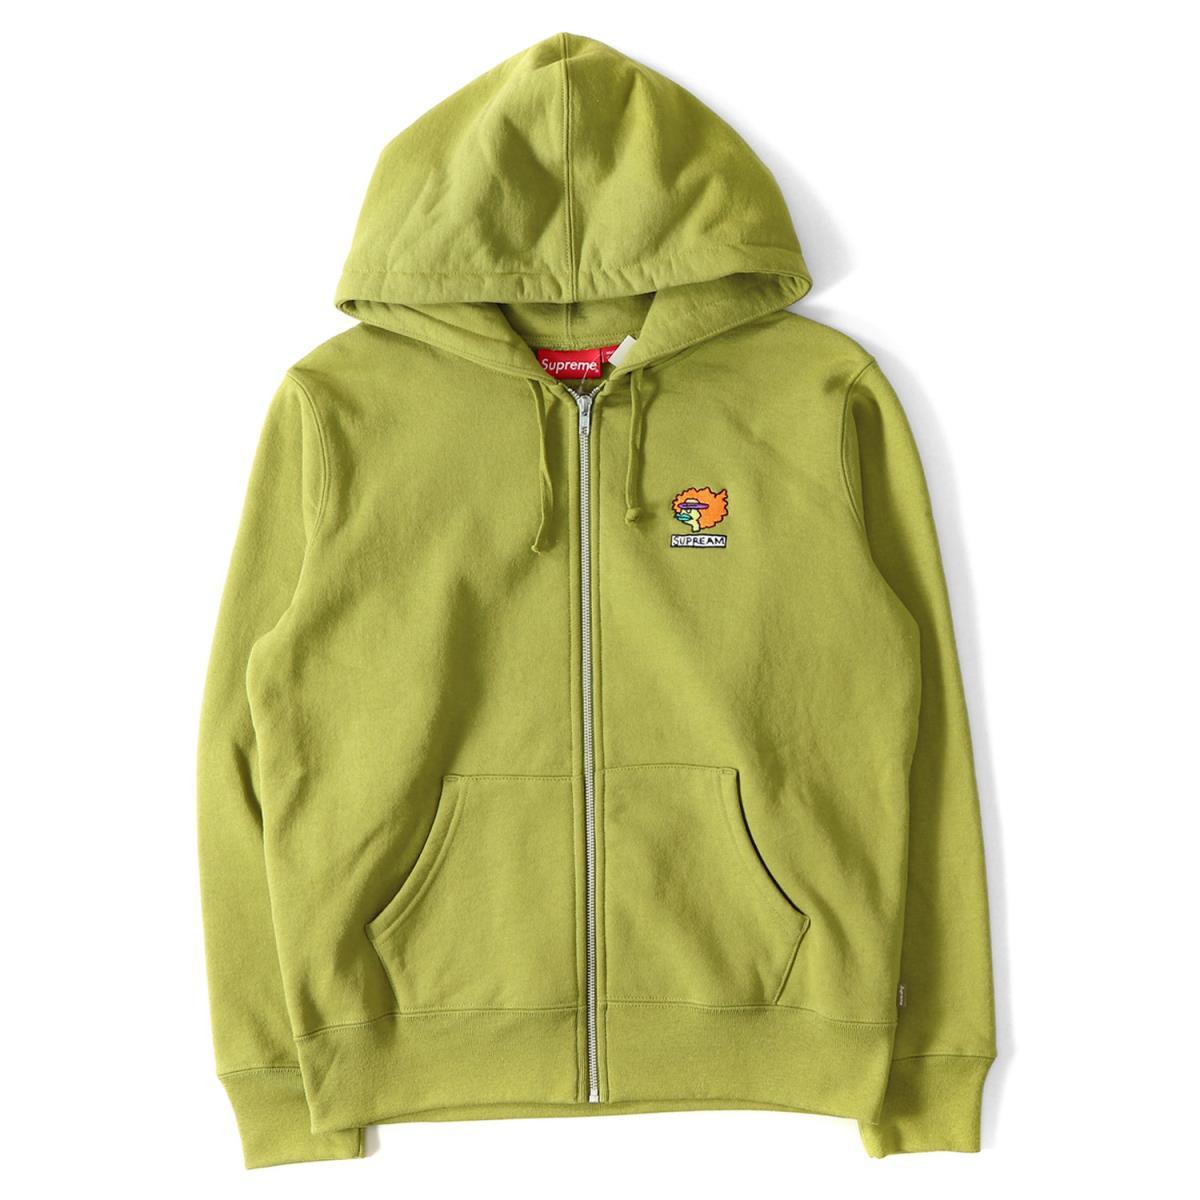 Supreme (シュプリーム) 17A/W ゴンズキャラ刺繍ジップスウェットパーカー(Gonz Ramm Zip Up Sweatshirt) モスグリーン S 【メンズ】【K2081】【あす楽☆対応可】